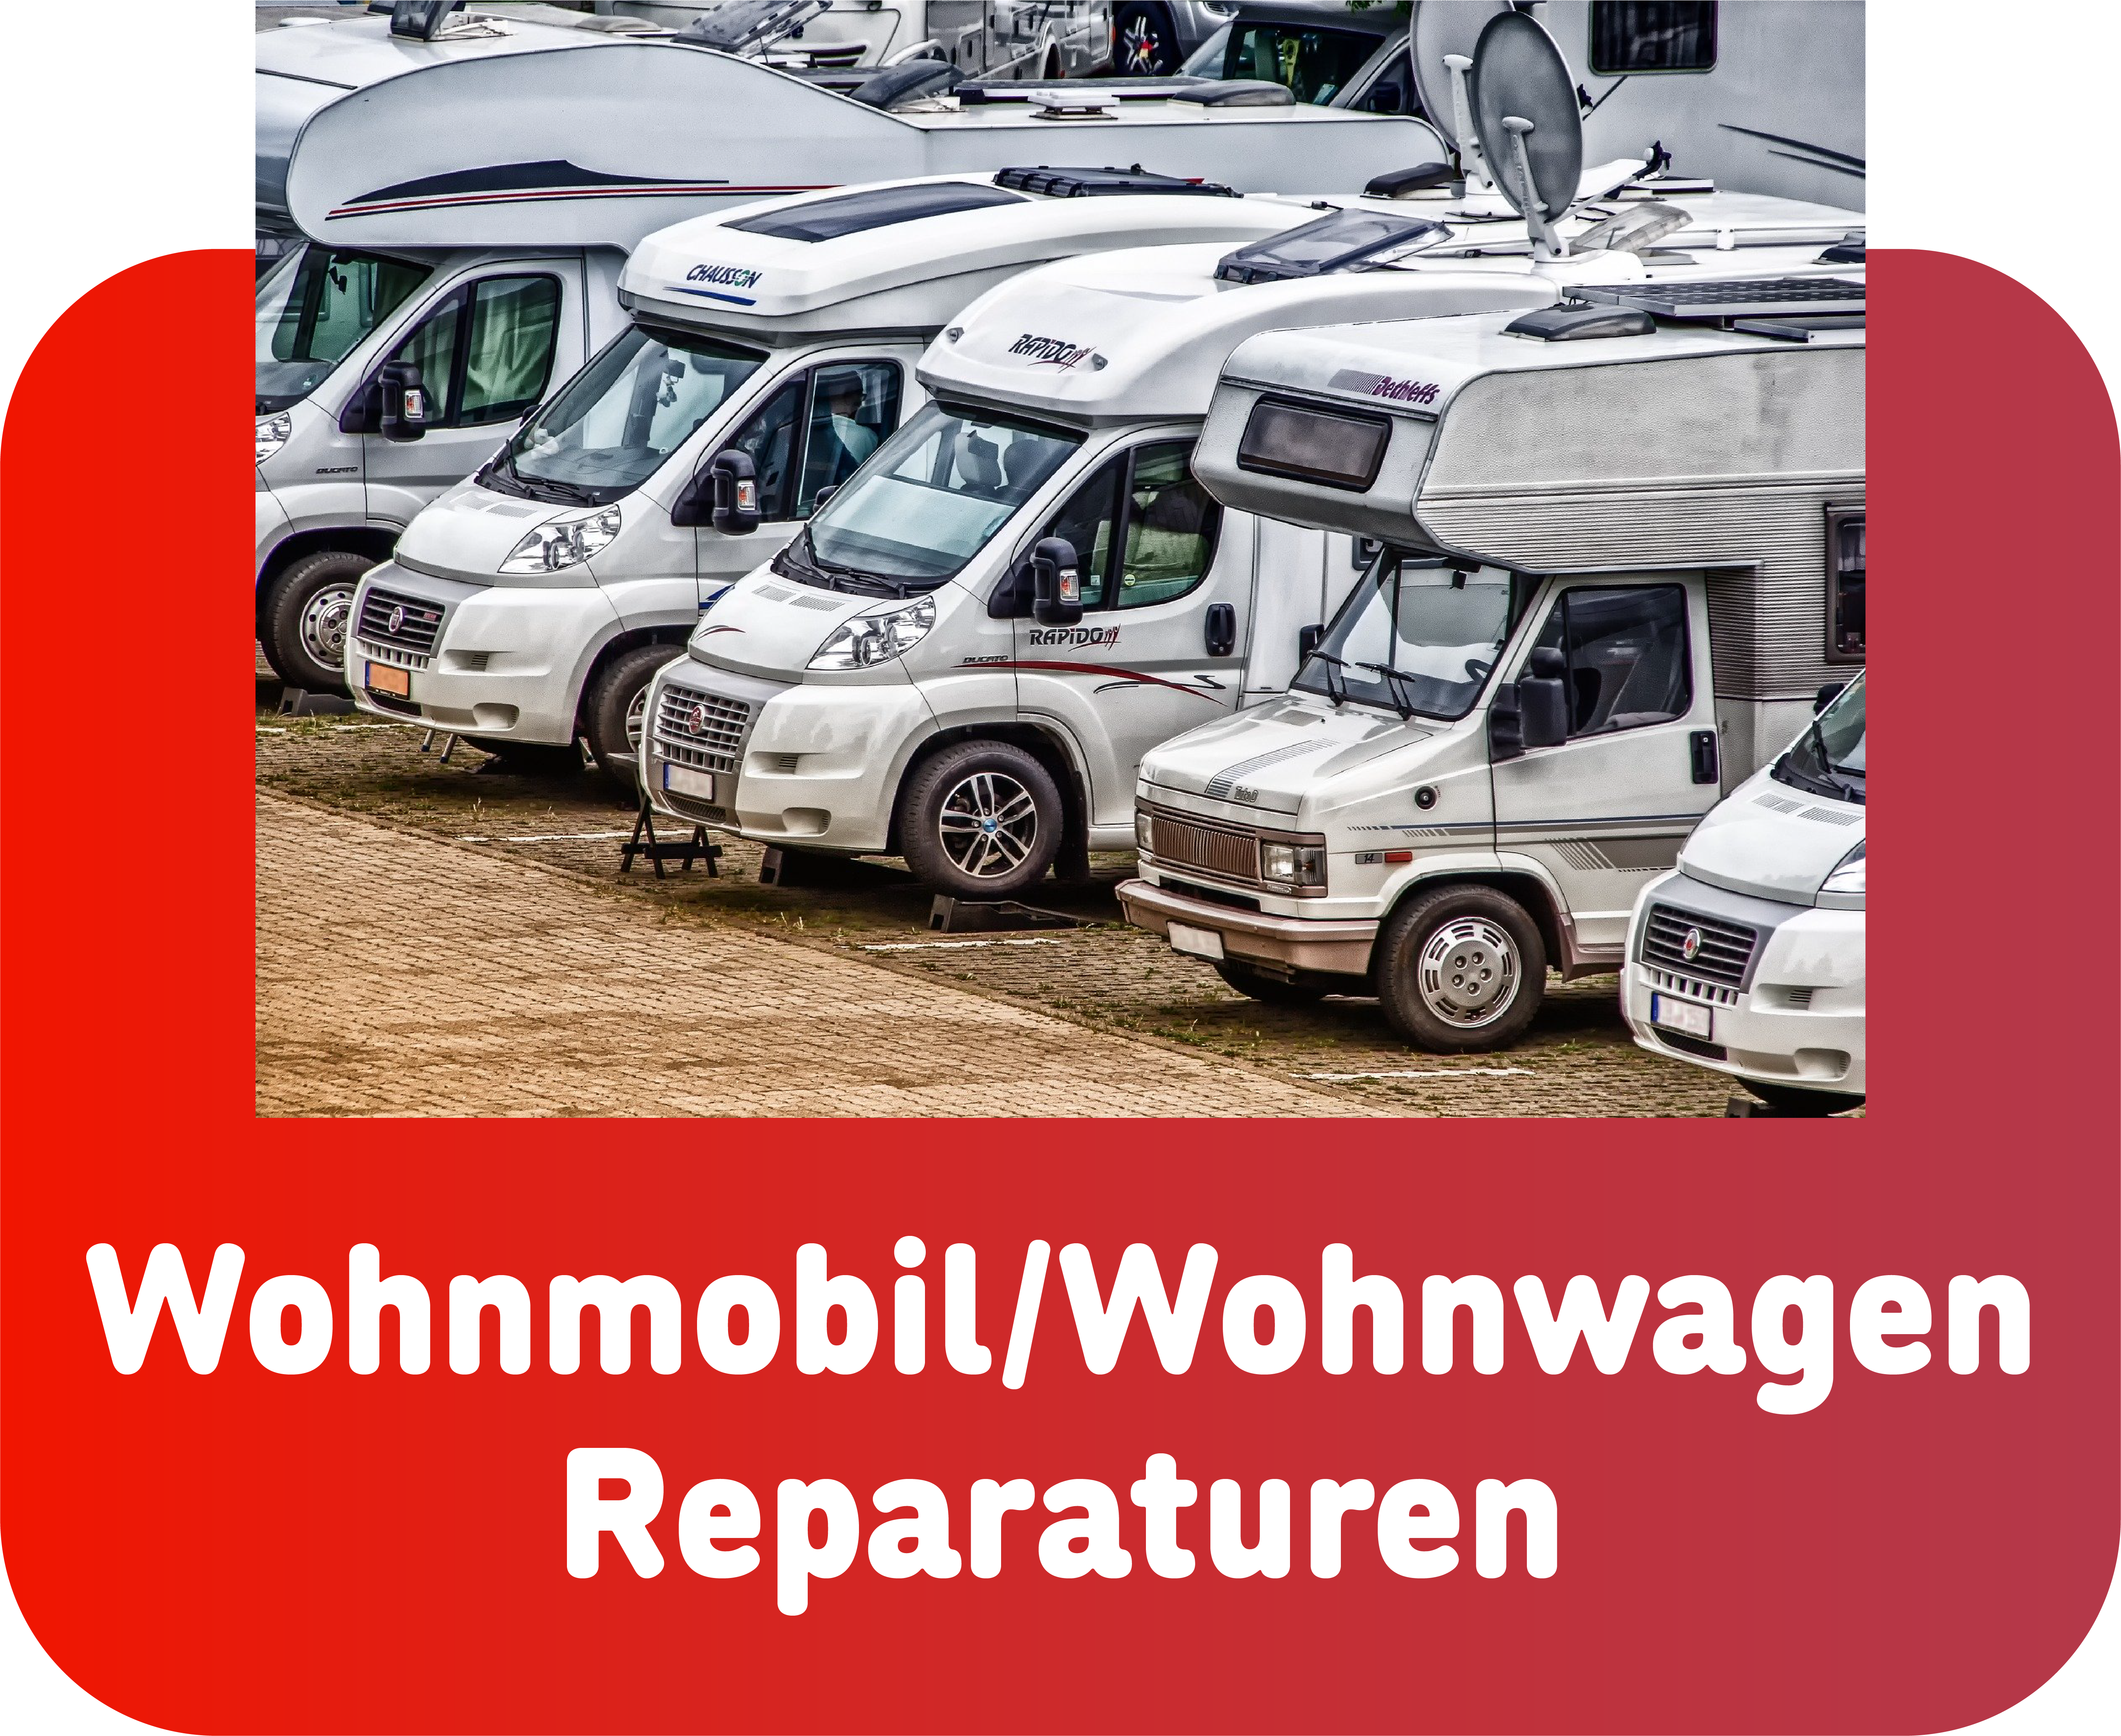 wohnmobil1